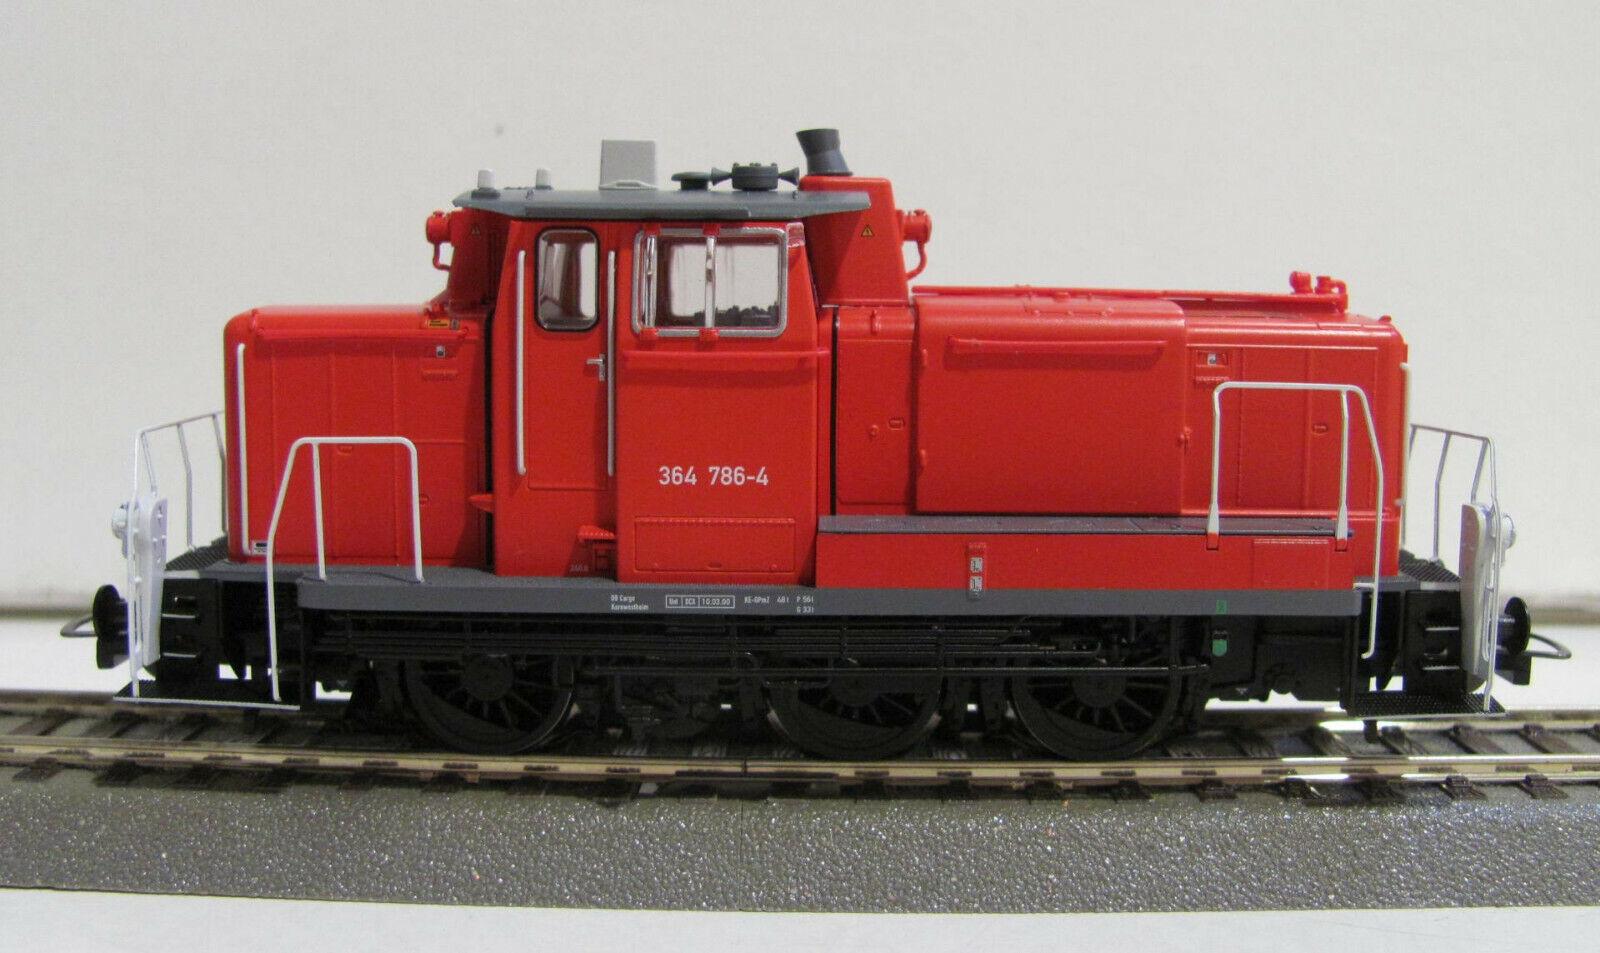 Piko 52822 Diesellok BR 364 786-4 der DBAG DBAG DBAG in Epoche V mit SOUND  | Erste Klasse in seiner Klasse  b281b5